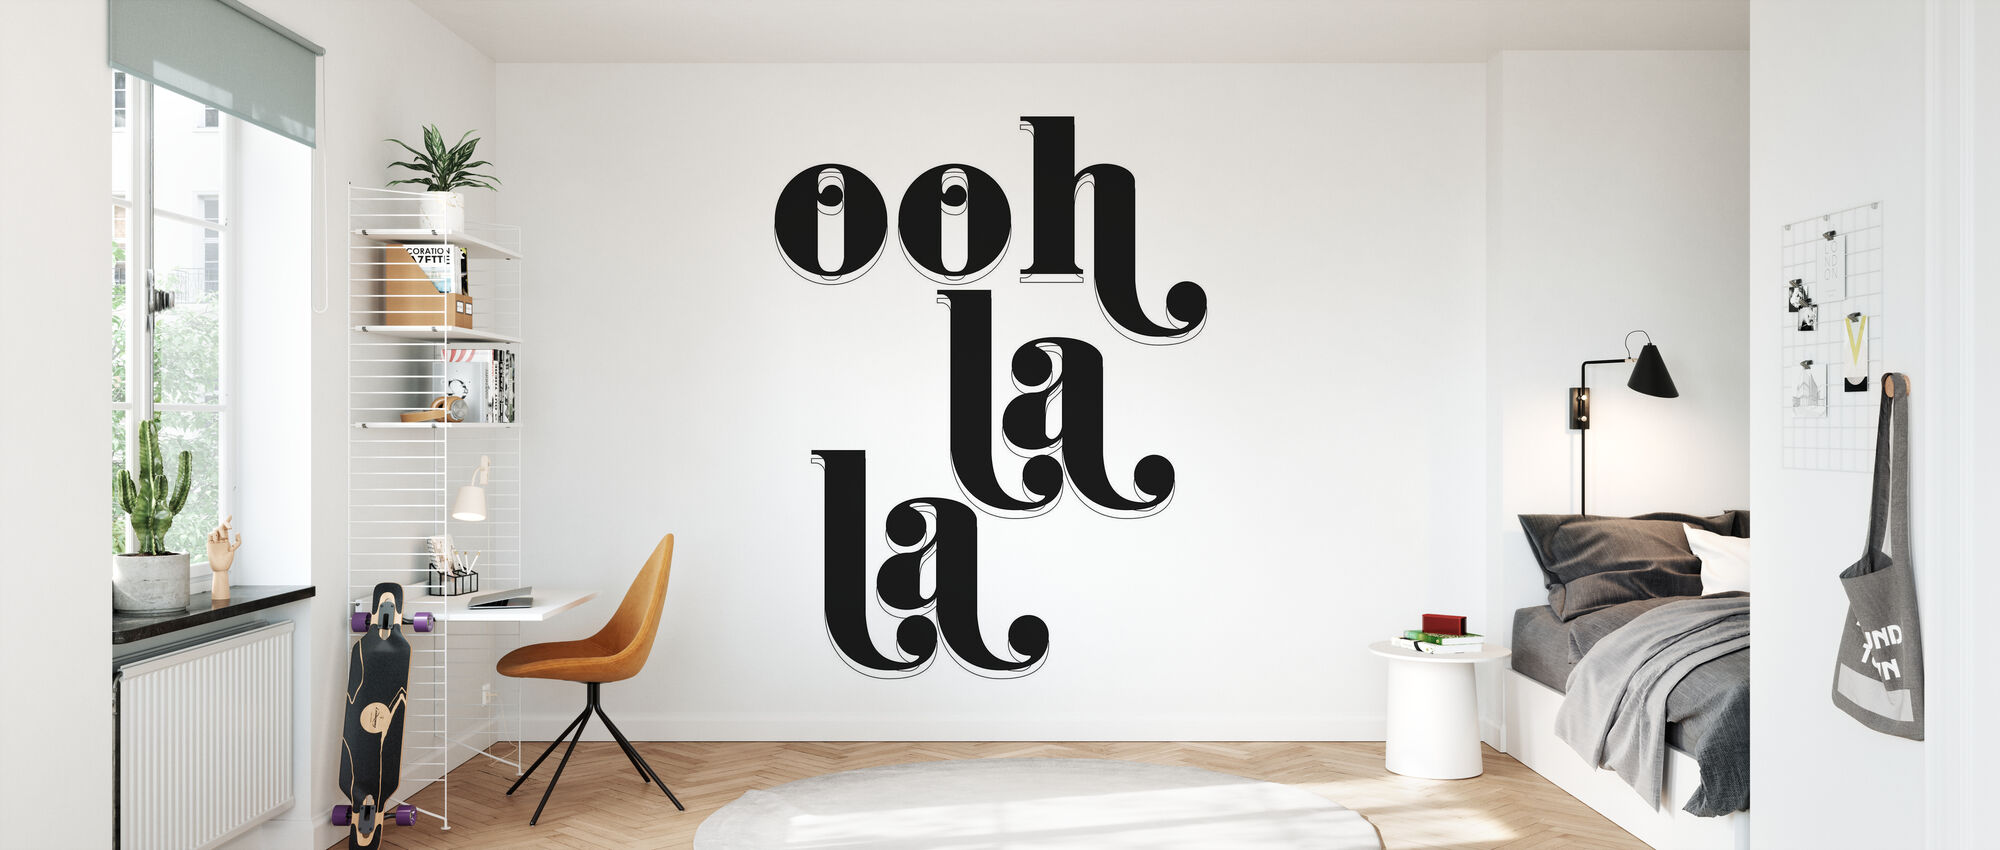 Ooh La La - Wallpaper - Kids Room